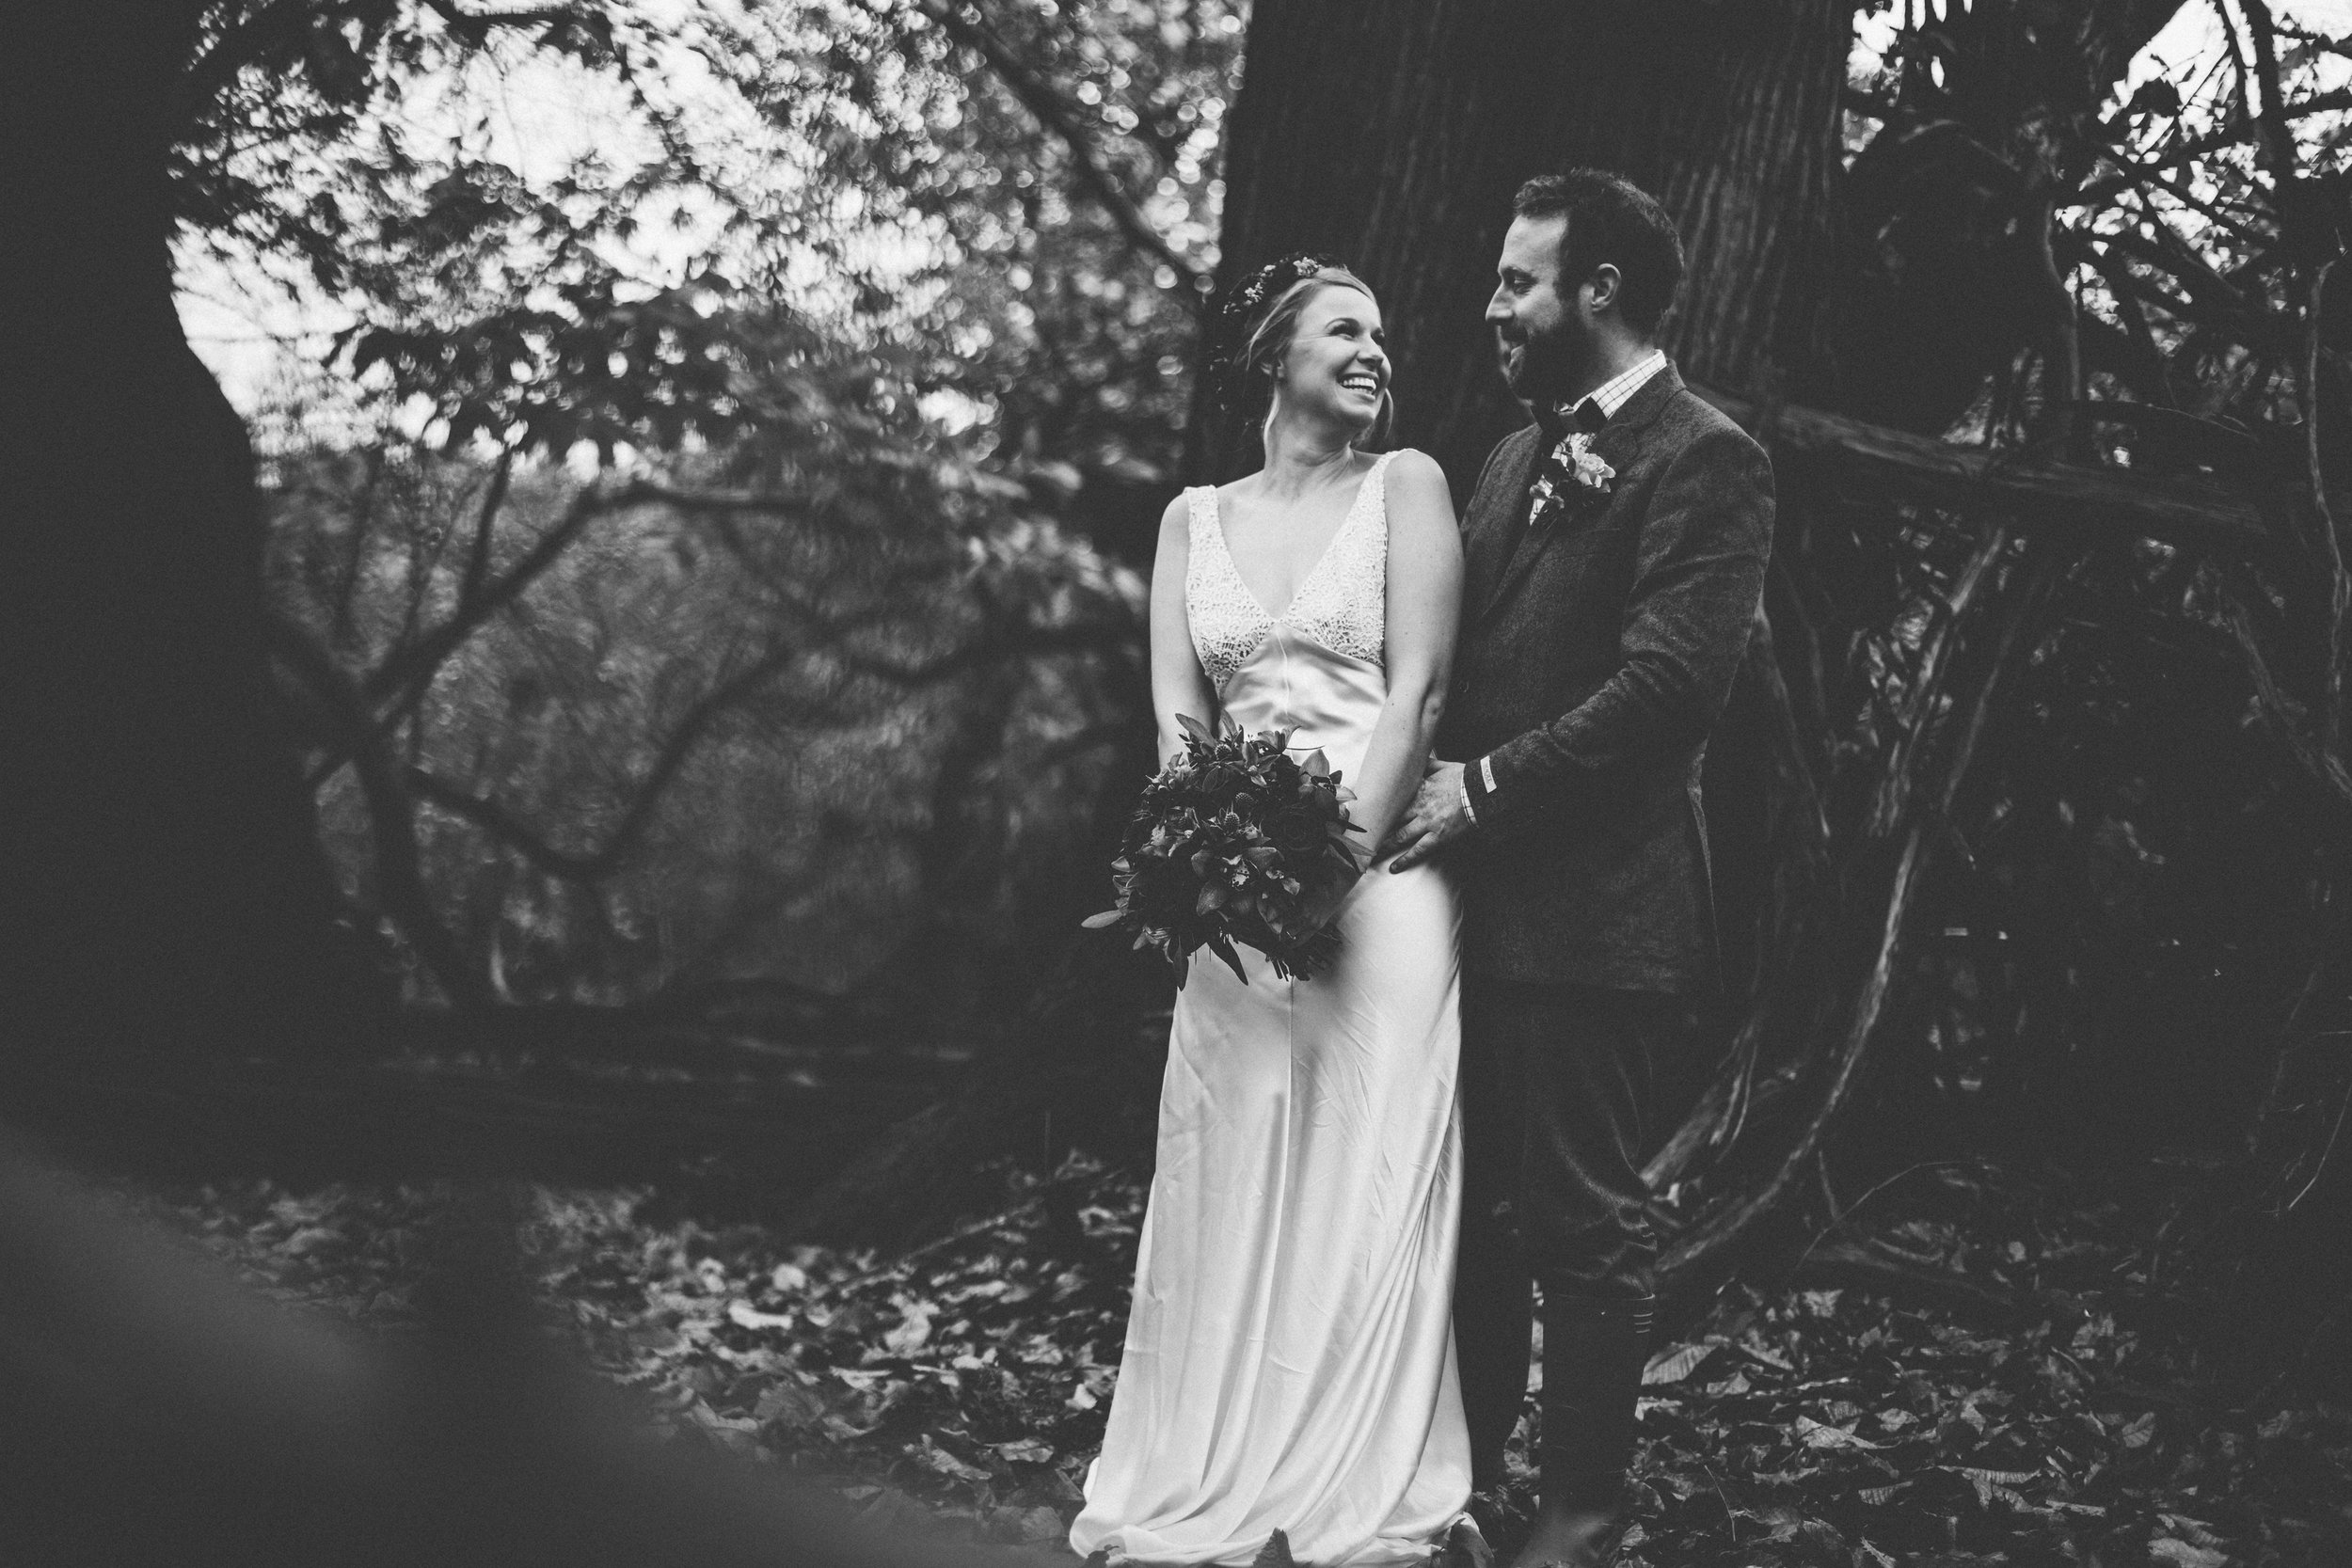 Kate-Beaumont-Wedding-Dresses-Autumn-Shoot-Rebecca-Tovey-6.jpg